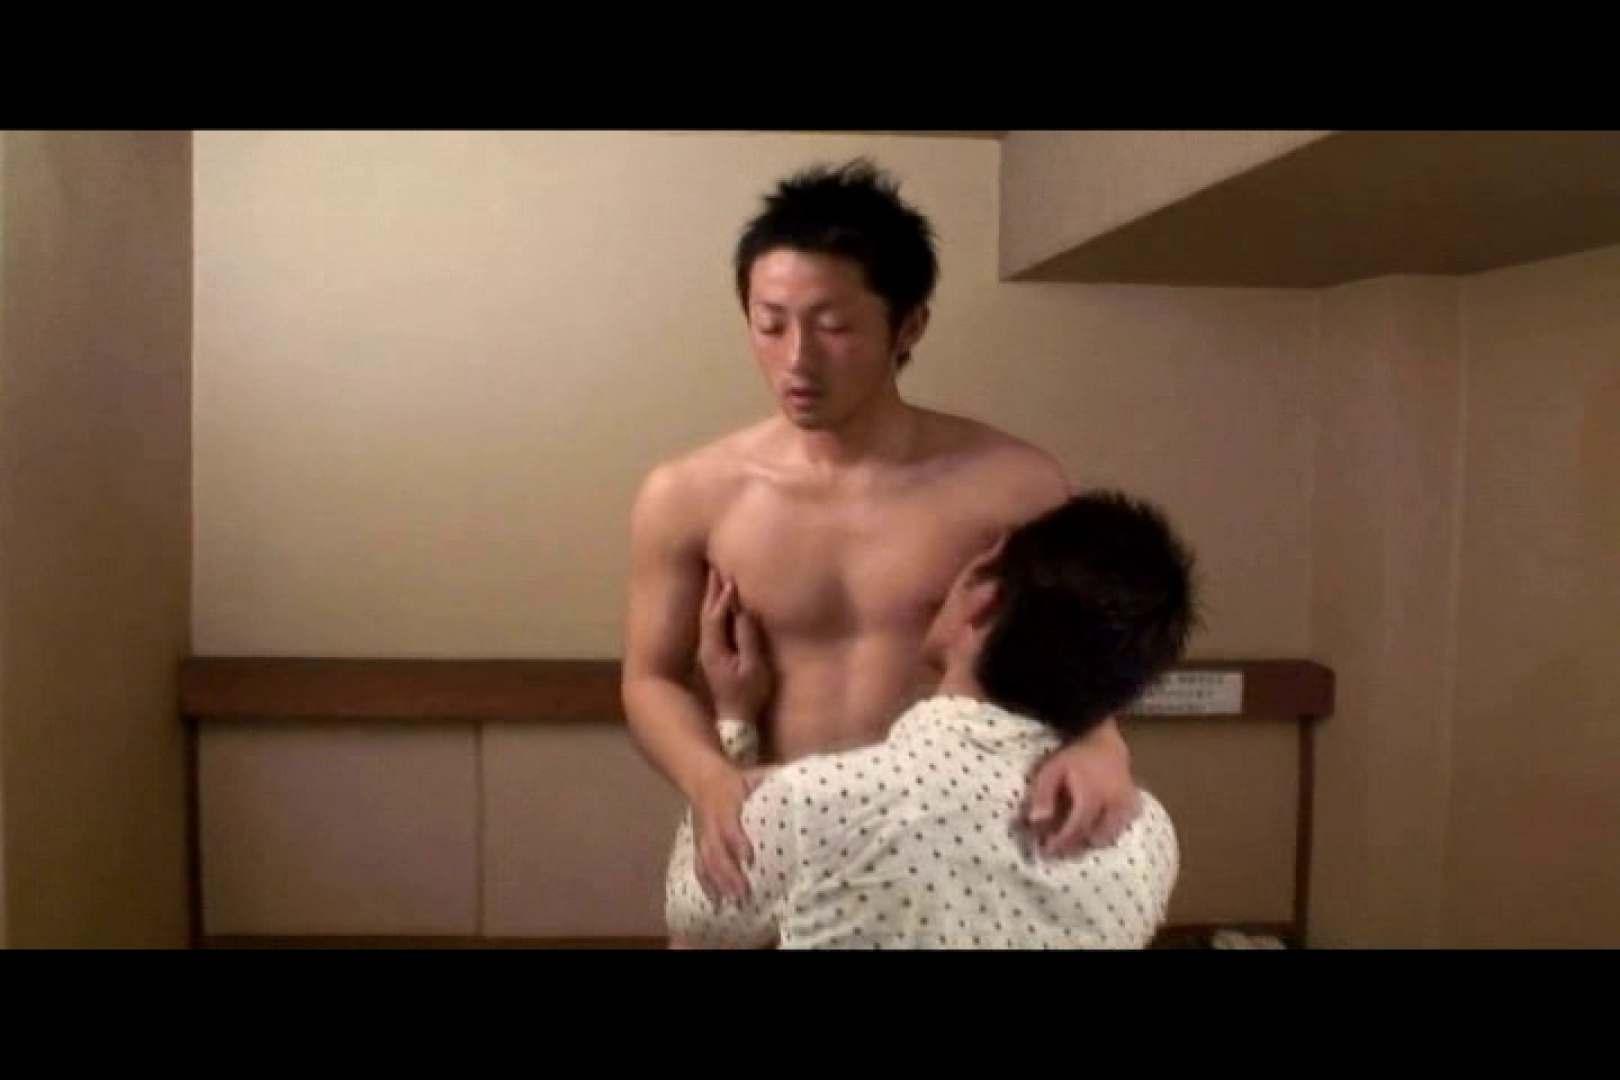 Bistro「イケメン」~Mokkori和風仕立て~vol.01 ゲイのプレイ | イケメンたち  97枚 69